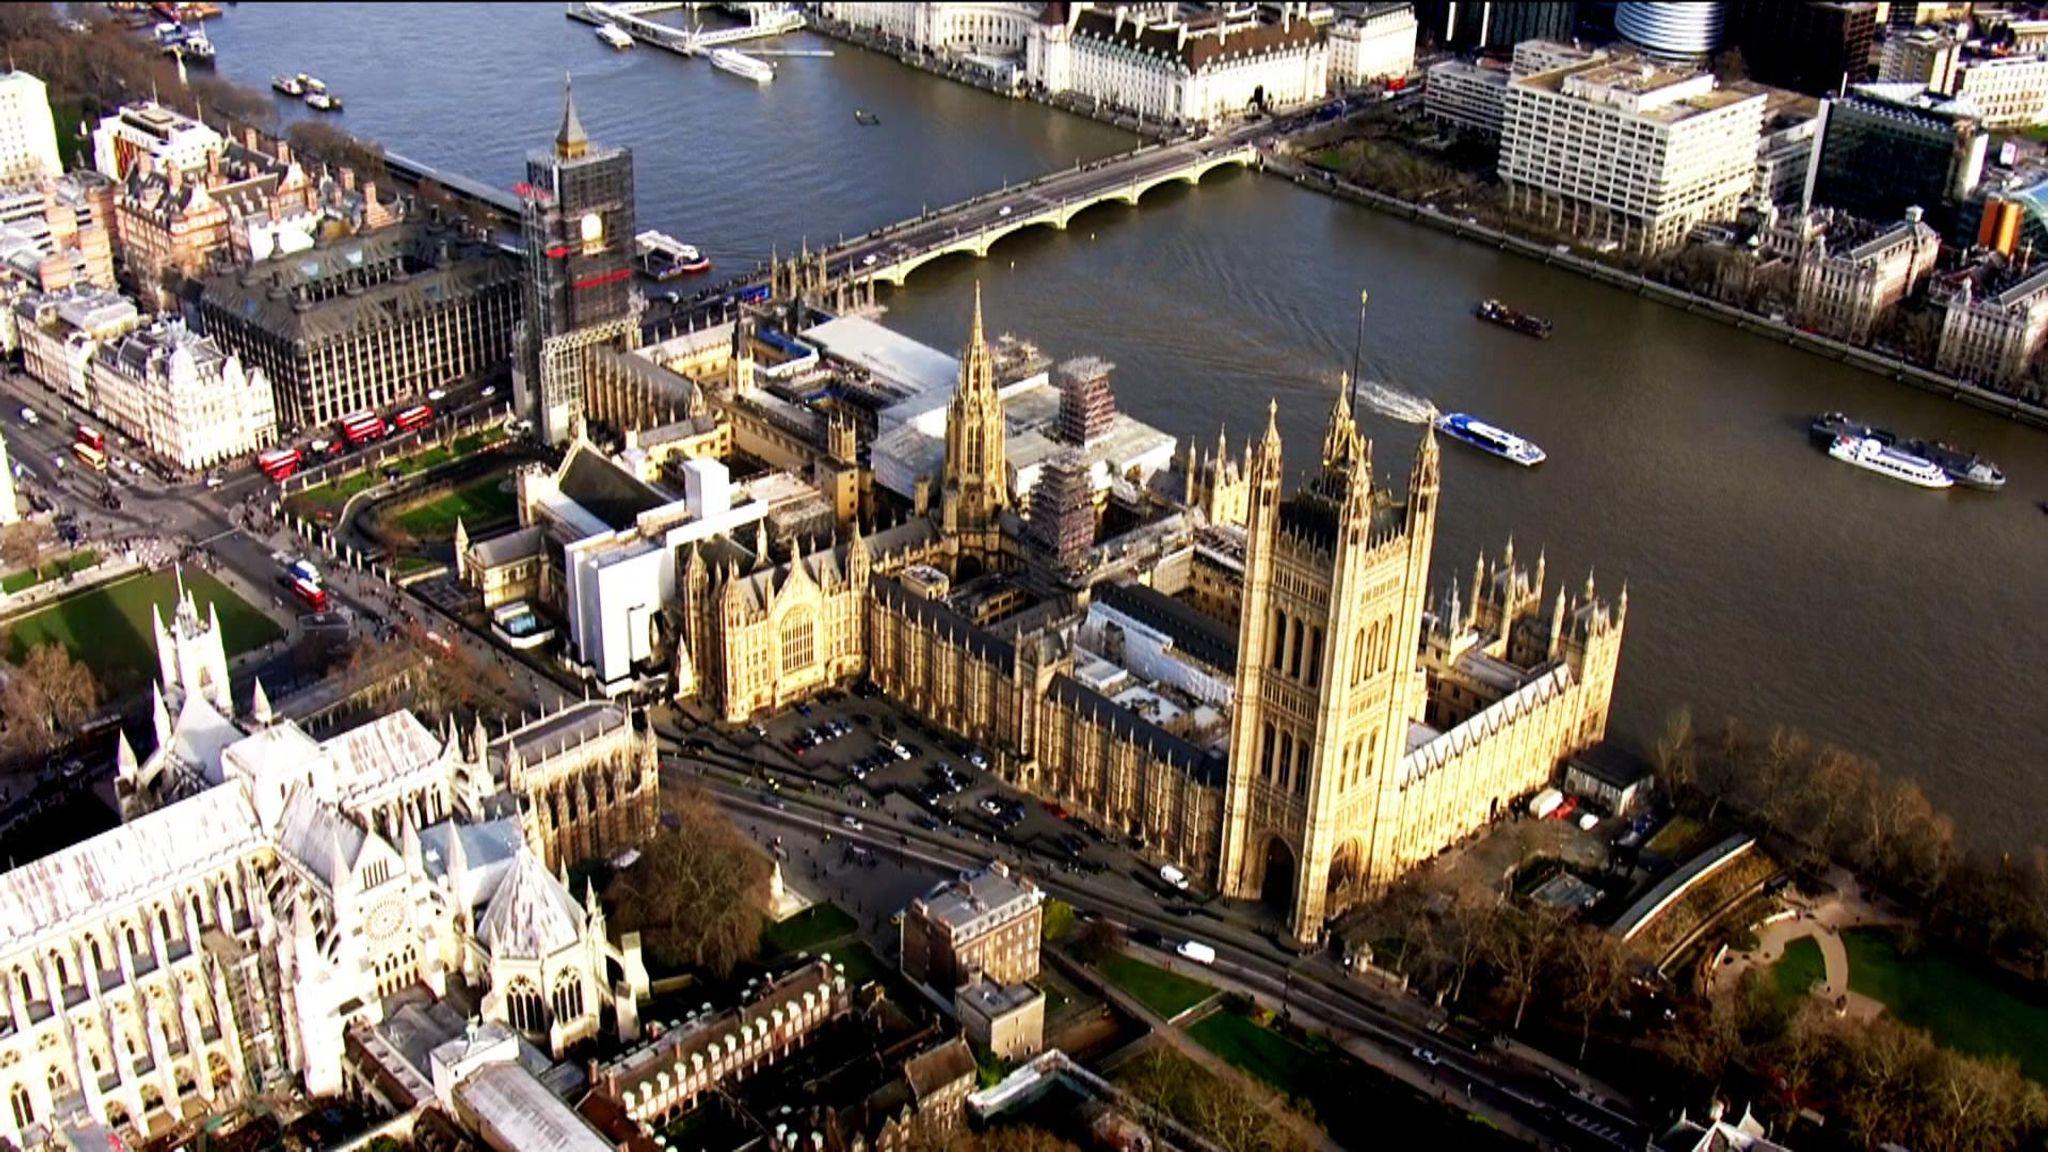 Brexit: Vote on PM's deal denied by Speaker John Bercow